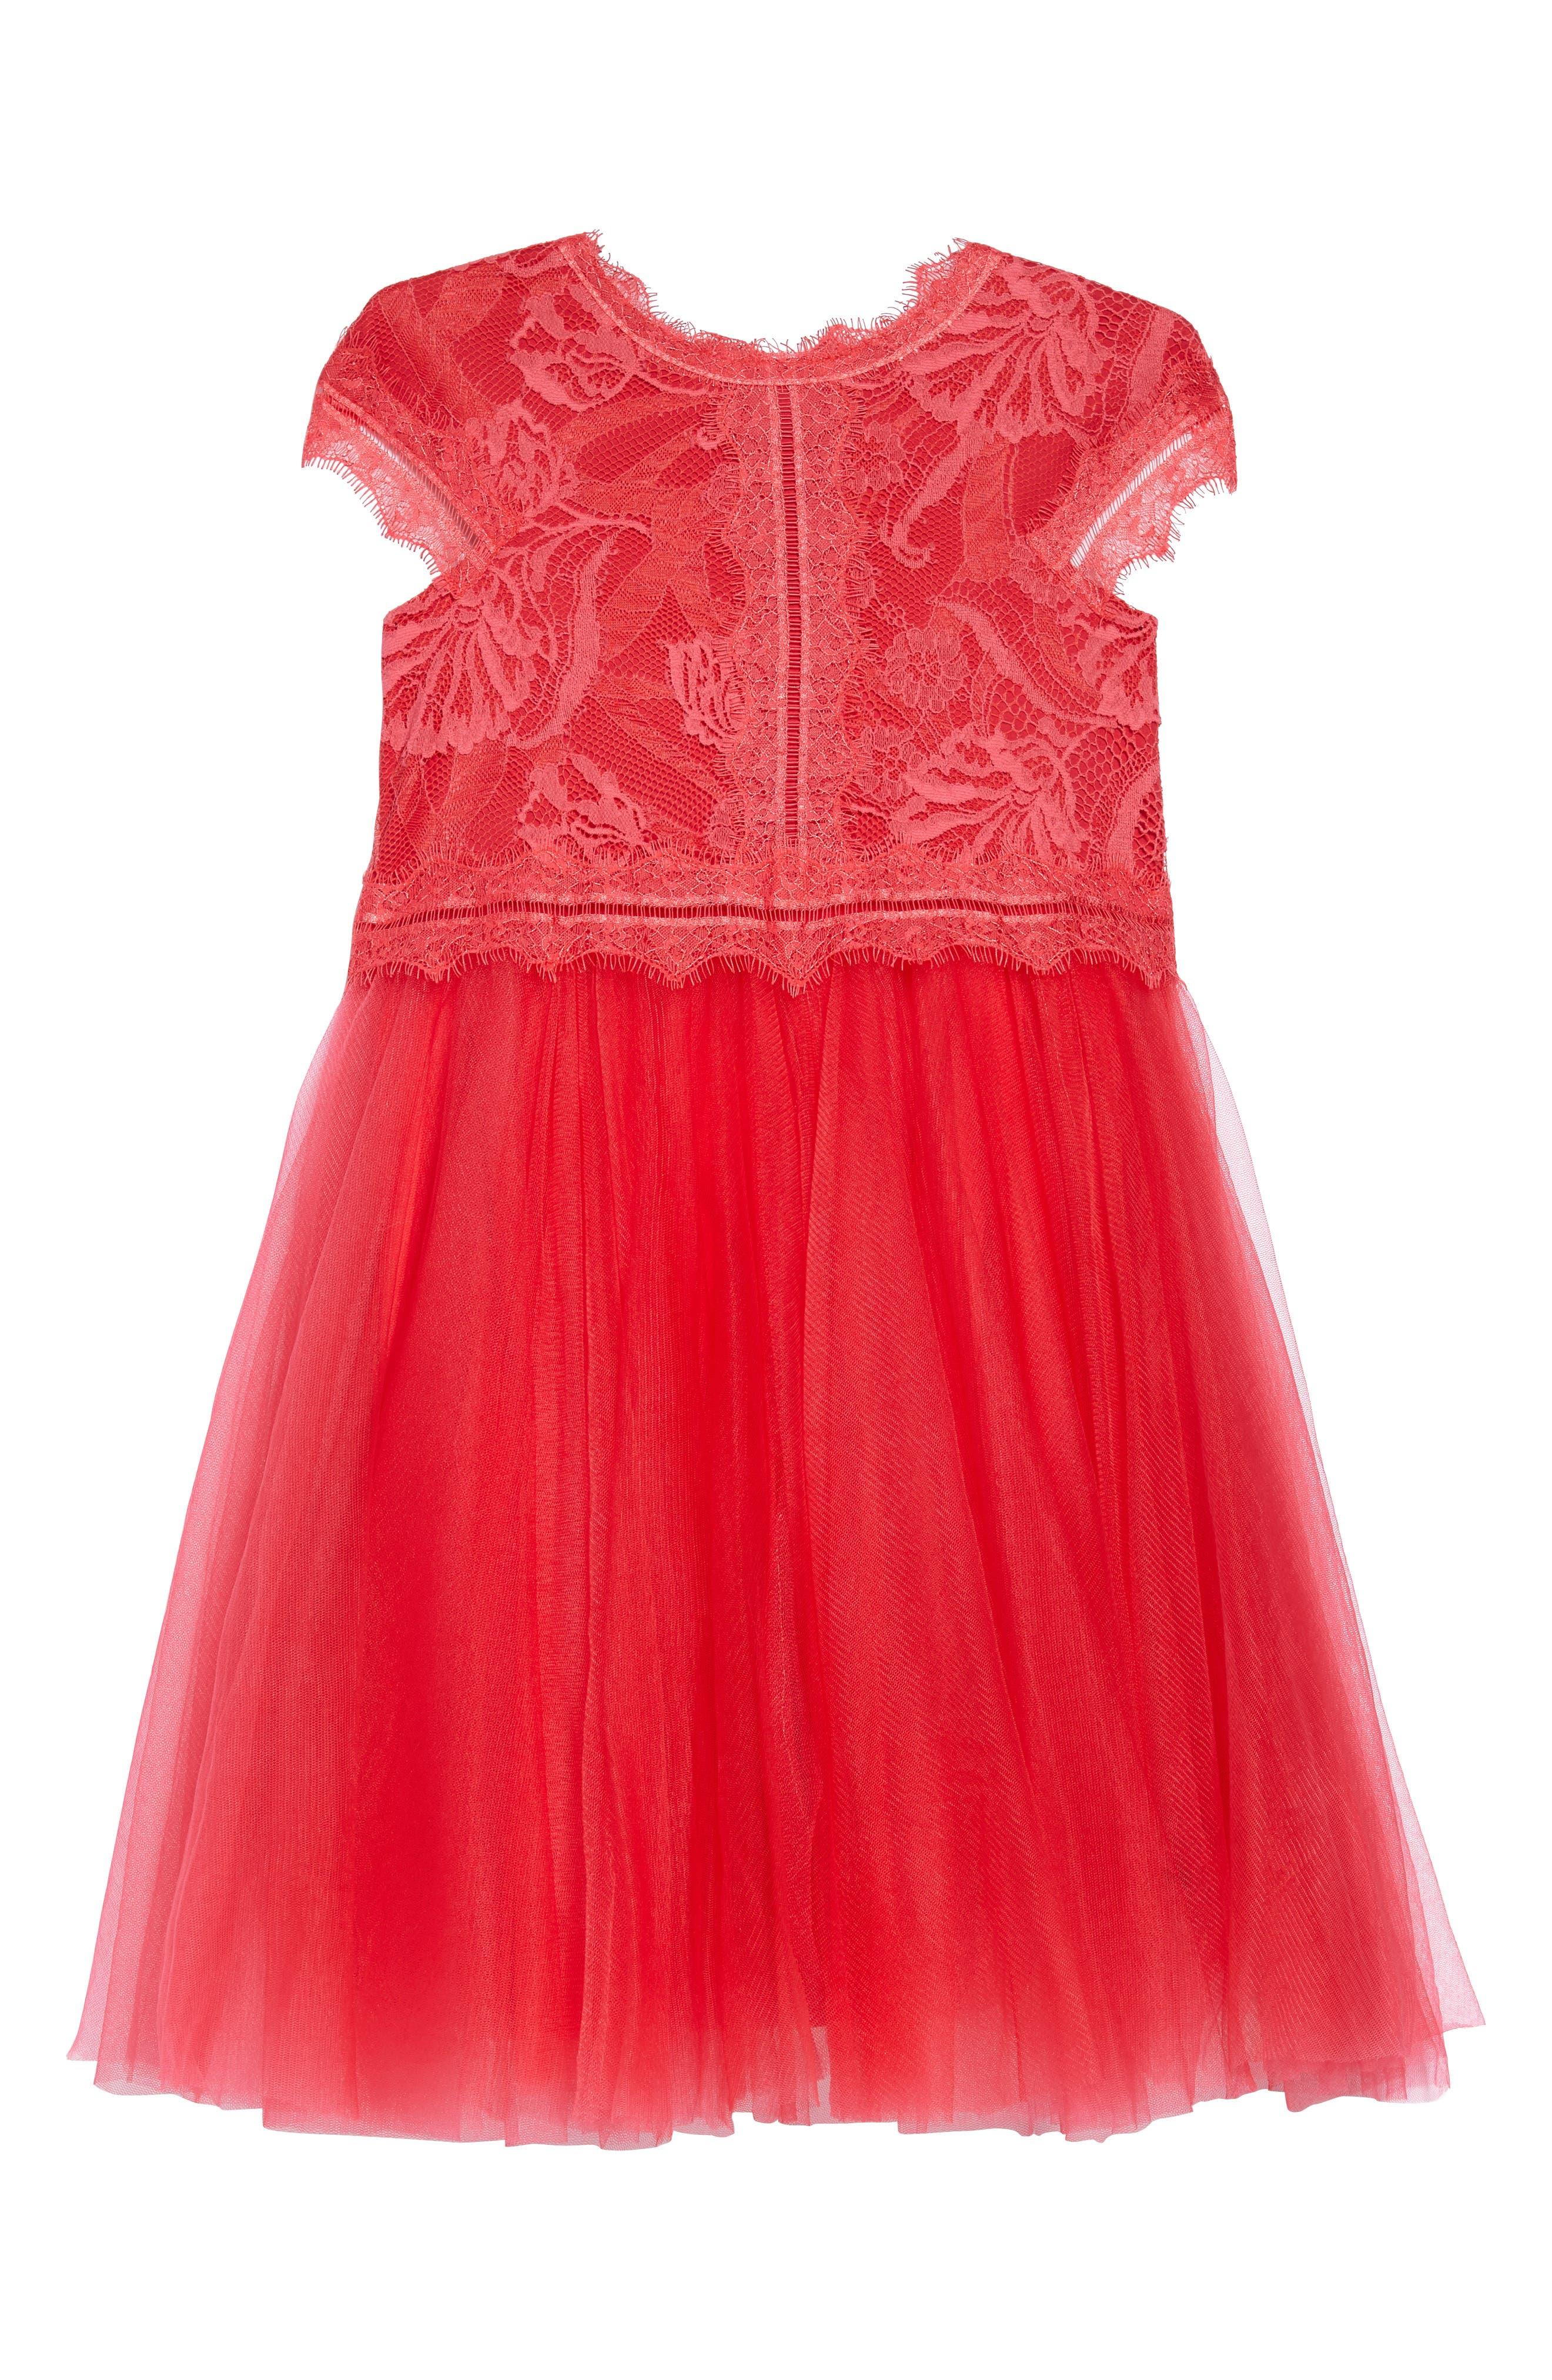 Floral Lace Tulle Dress,                         Main,                         color, 605